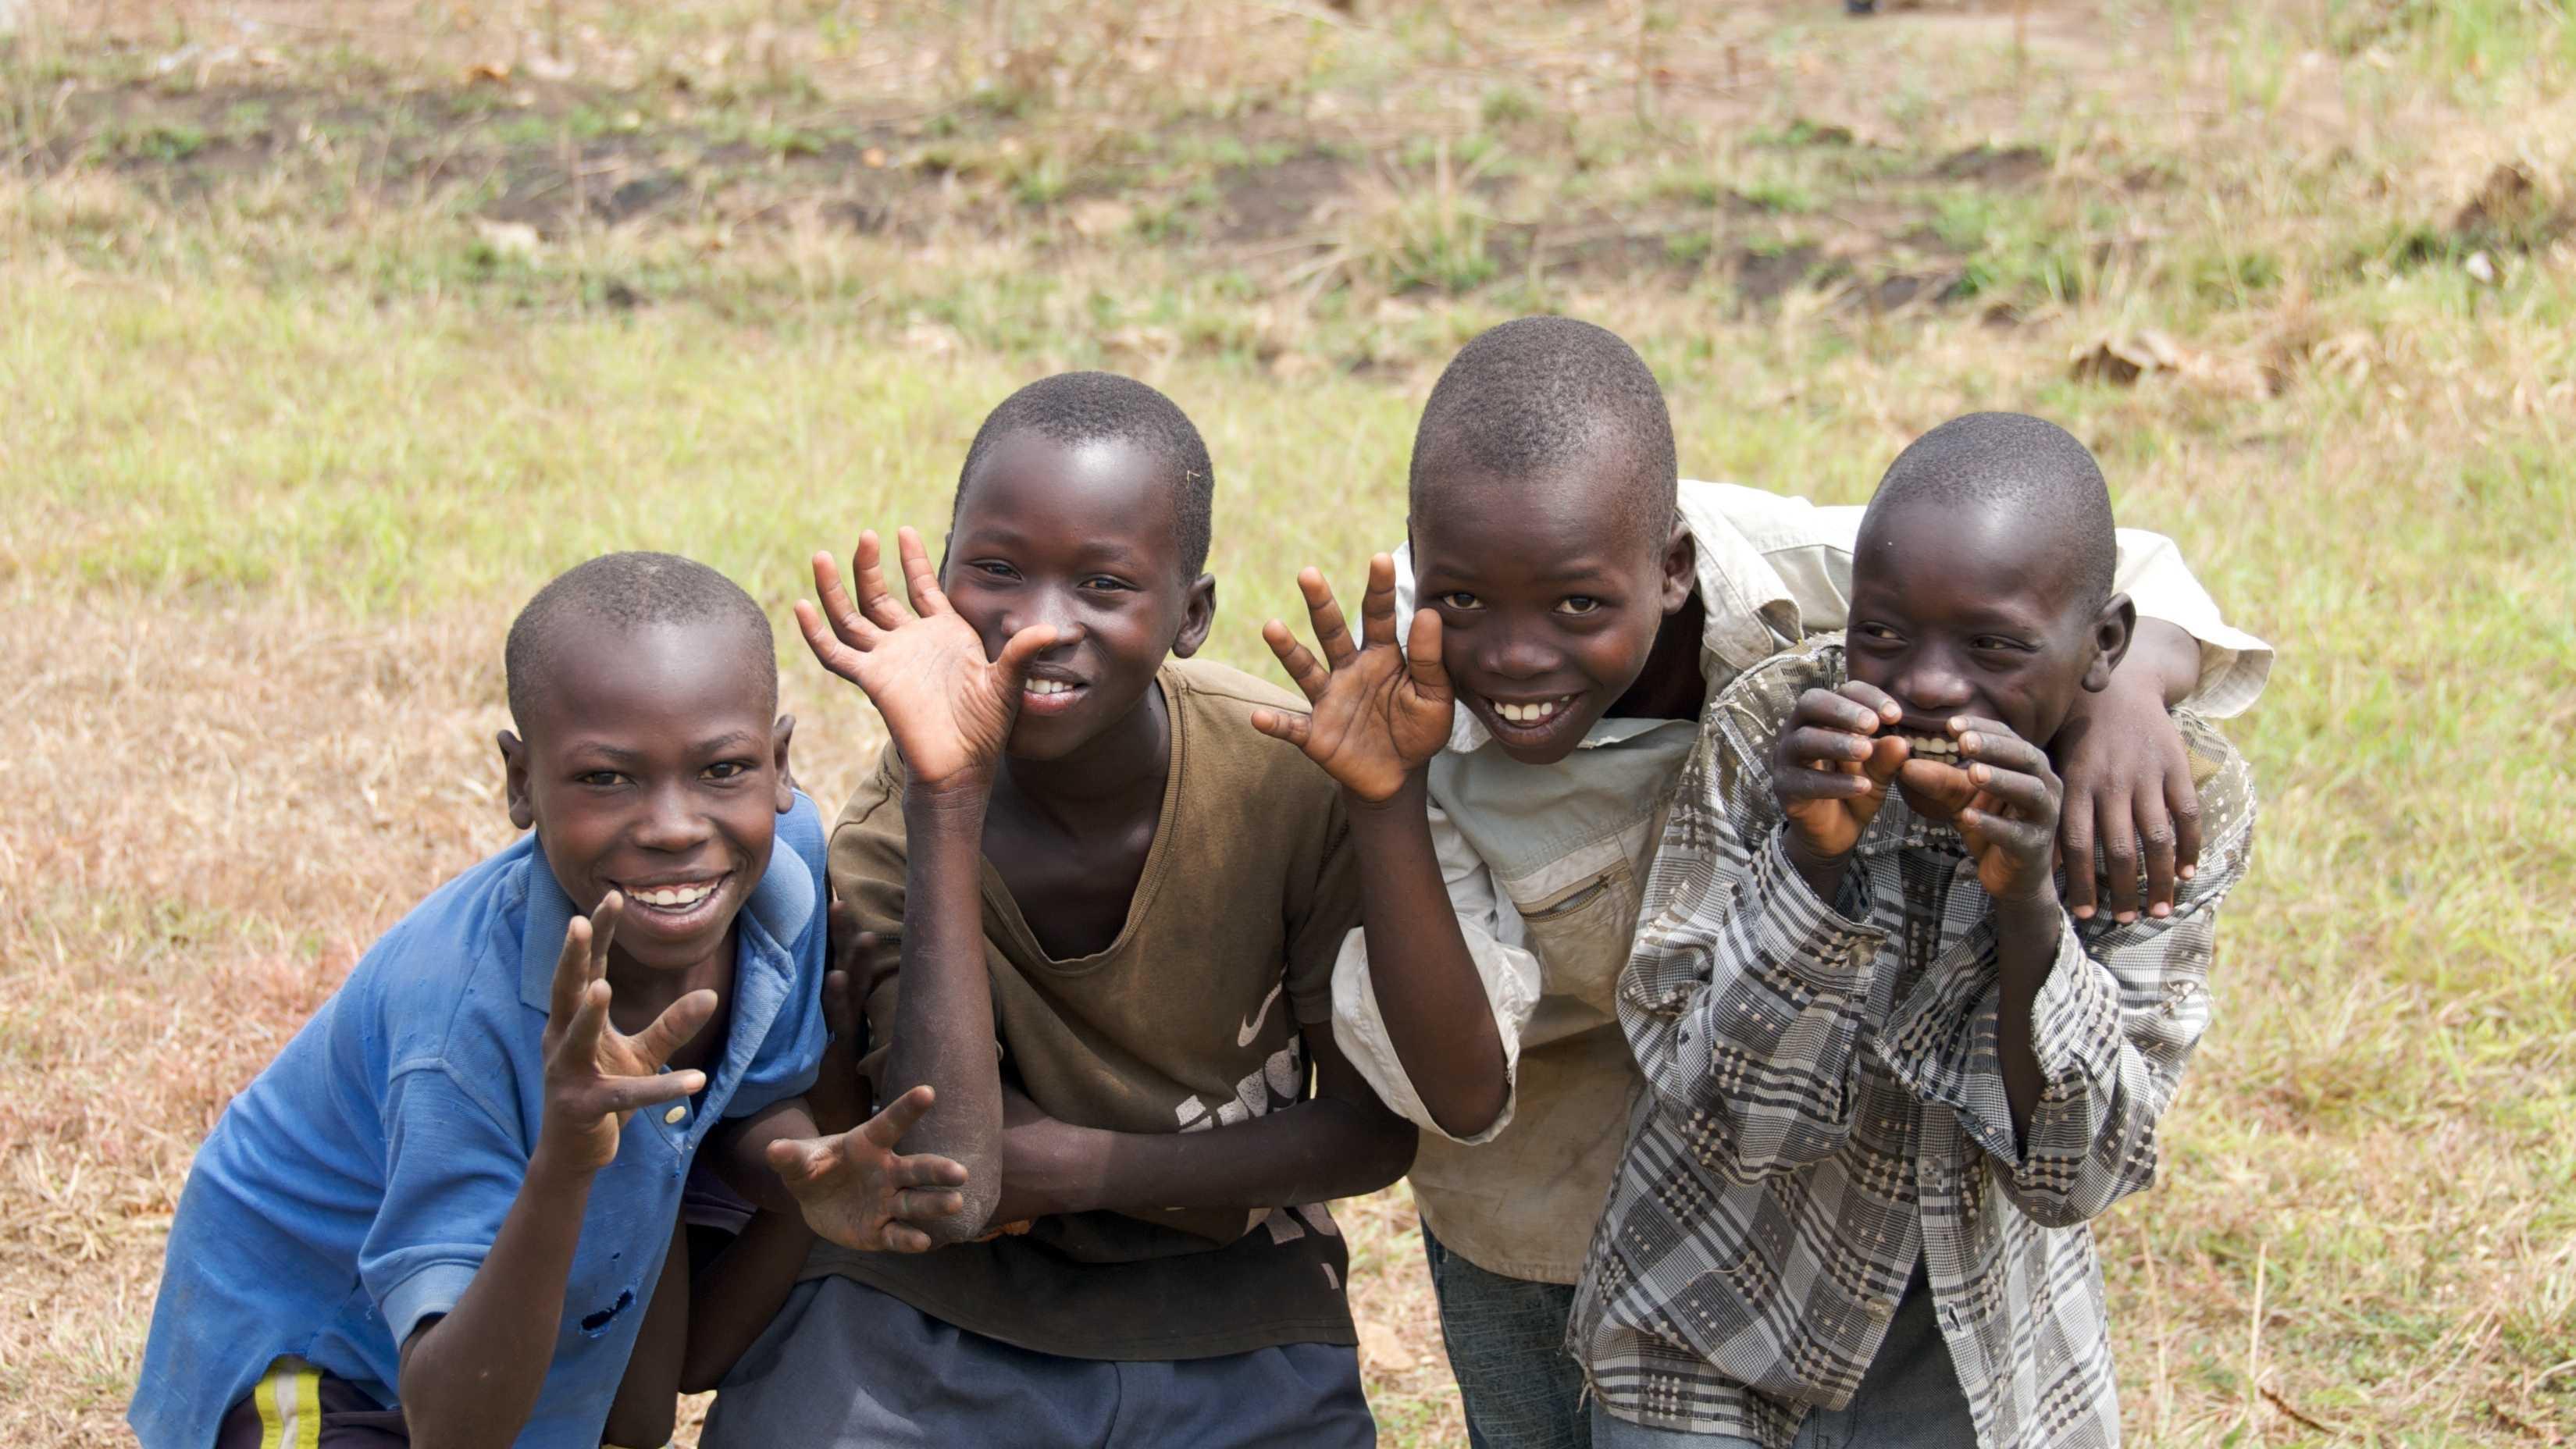 South Sudan kids